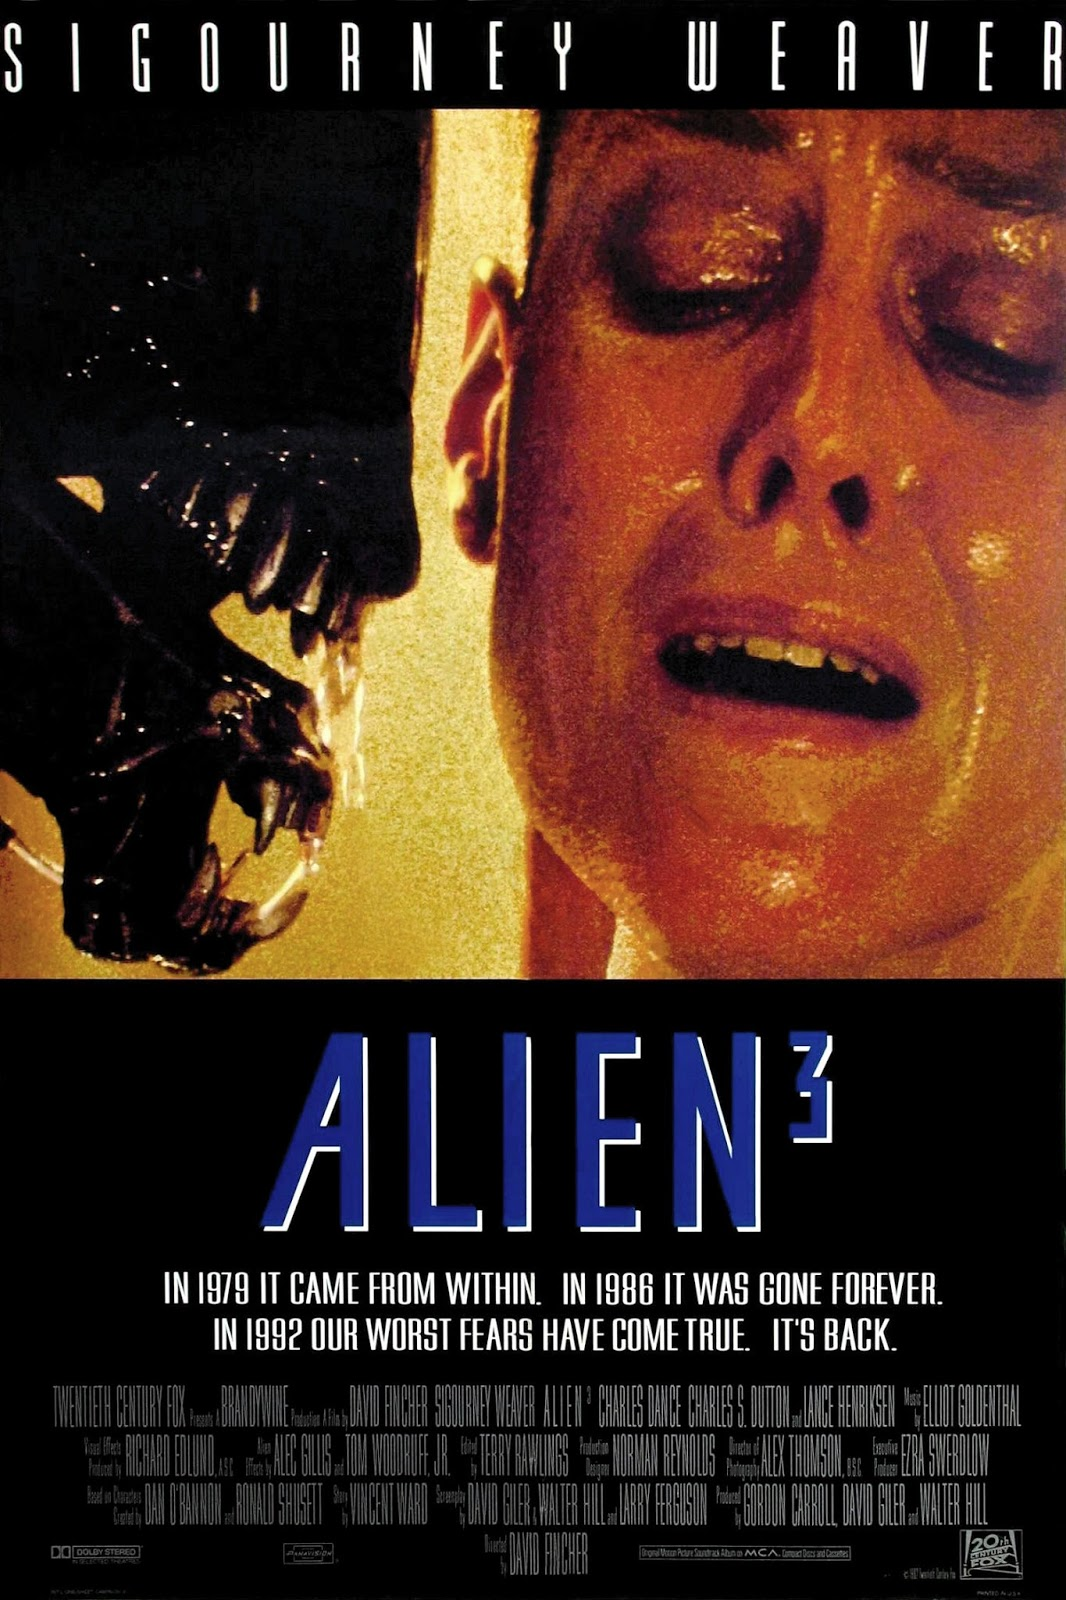 http://descubrepelis.blogspot.com/2014/07/alien-alien-3.html